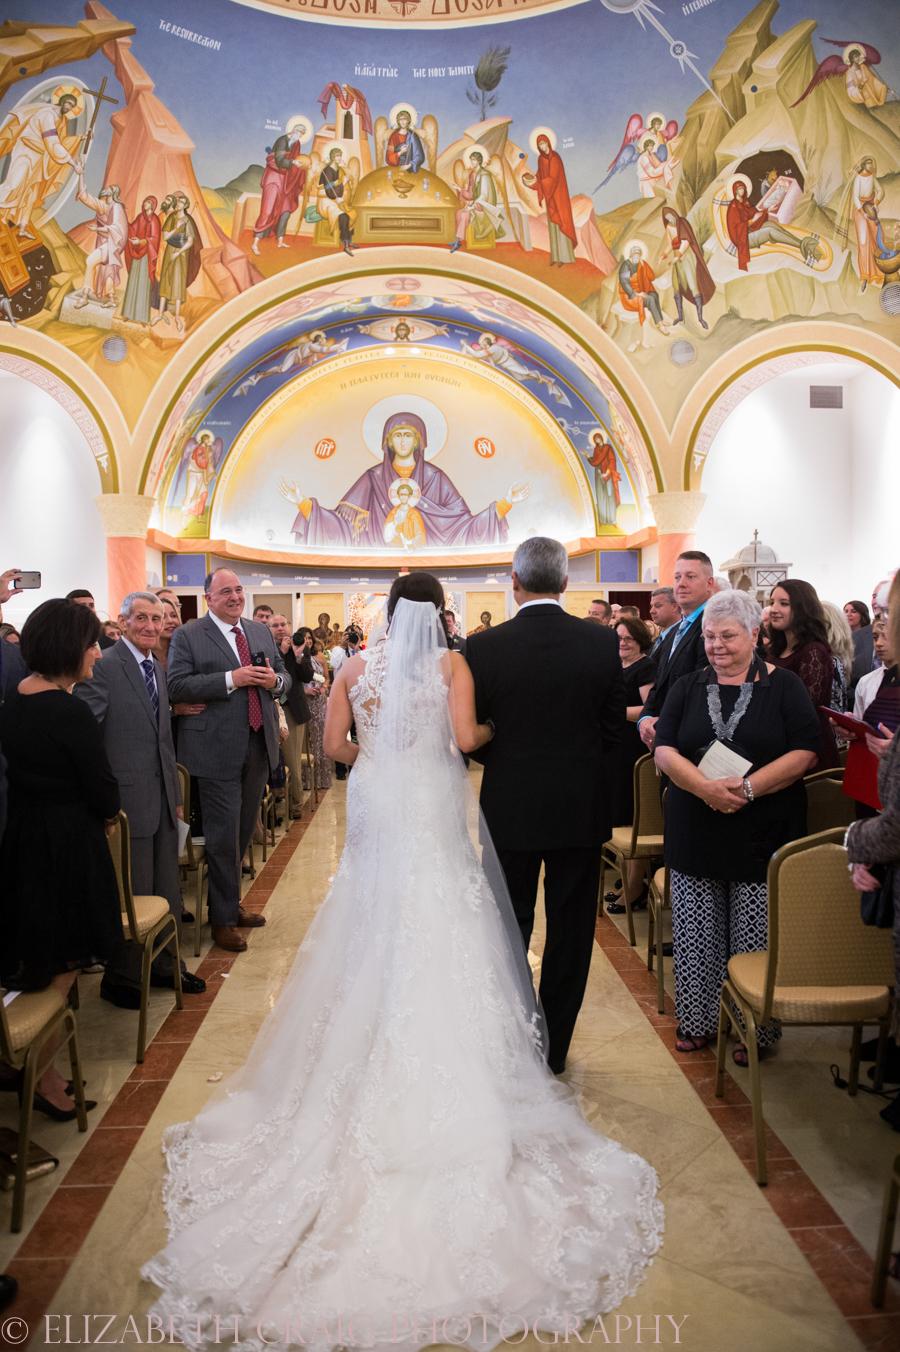 pittsburgh-greek-weddings-fairmont-weddings-receptions-elizabeth-craig-photohgraphy-006